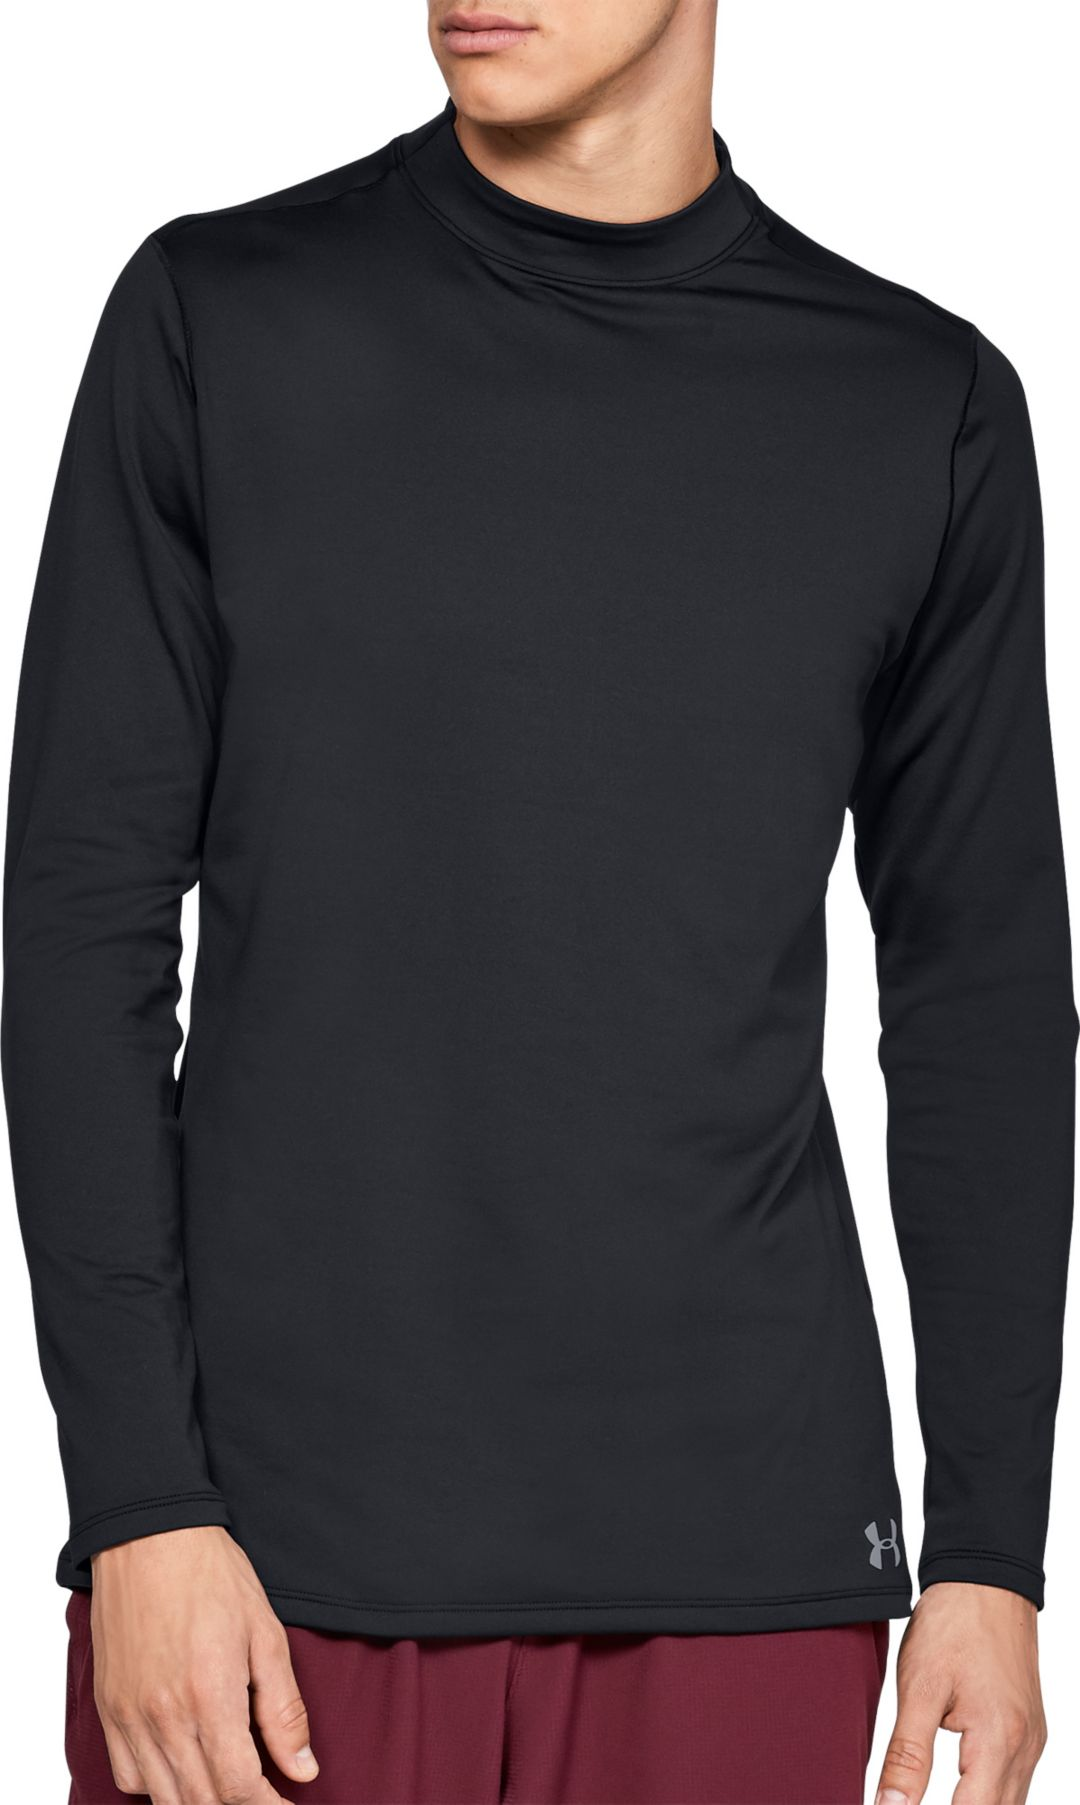 cb7360a1f Under Armour Men's ColdGear Armour Mock Neck Long Sleeve Shirt ...